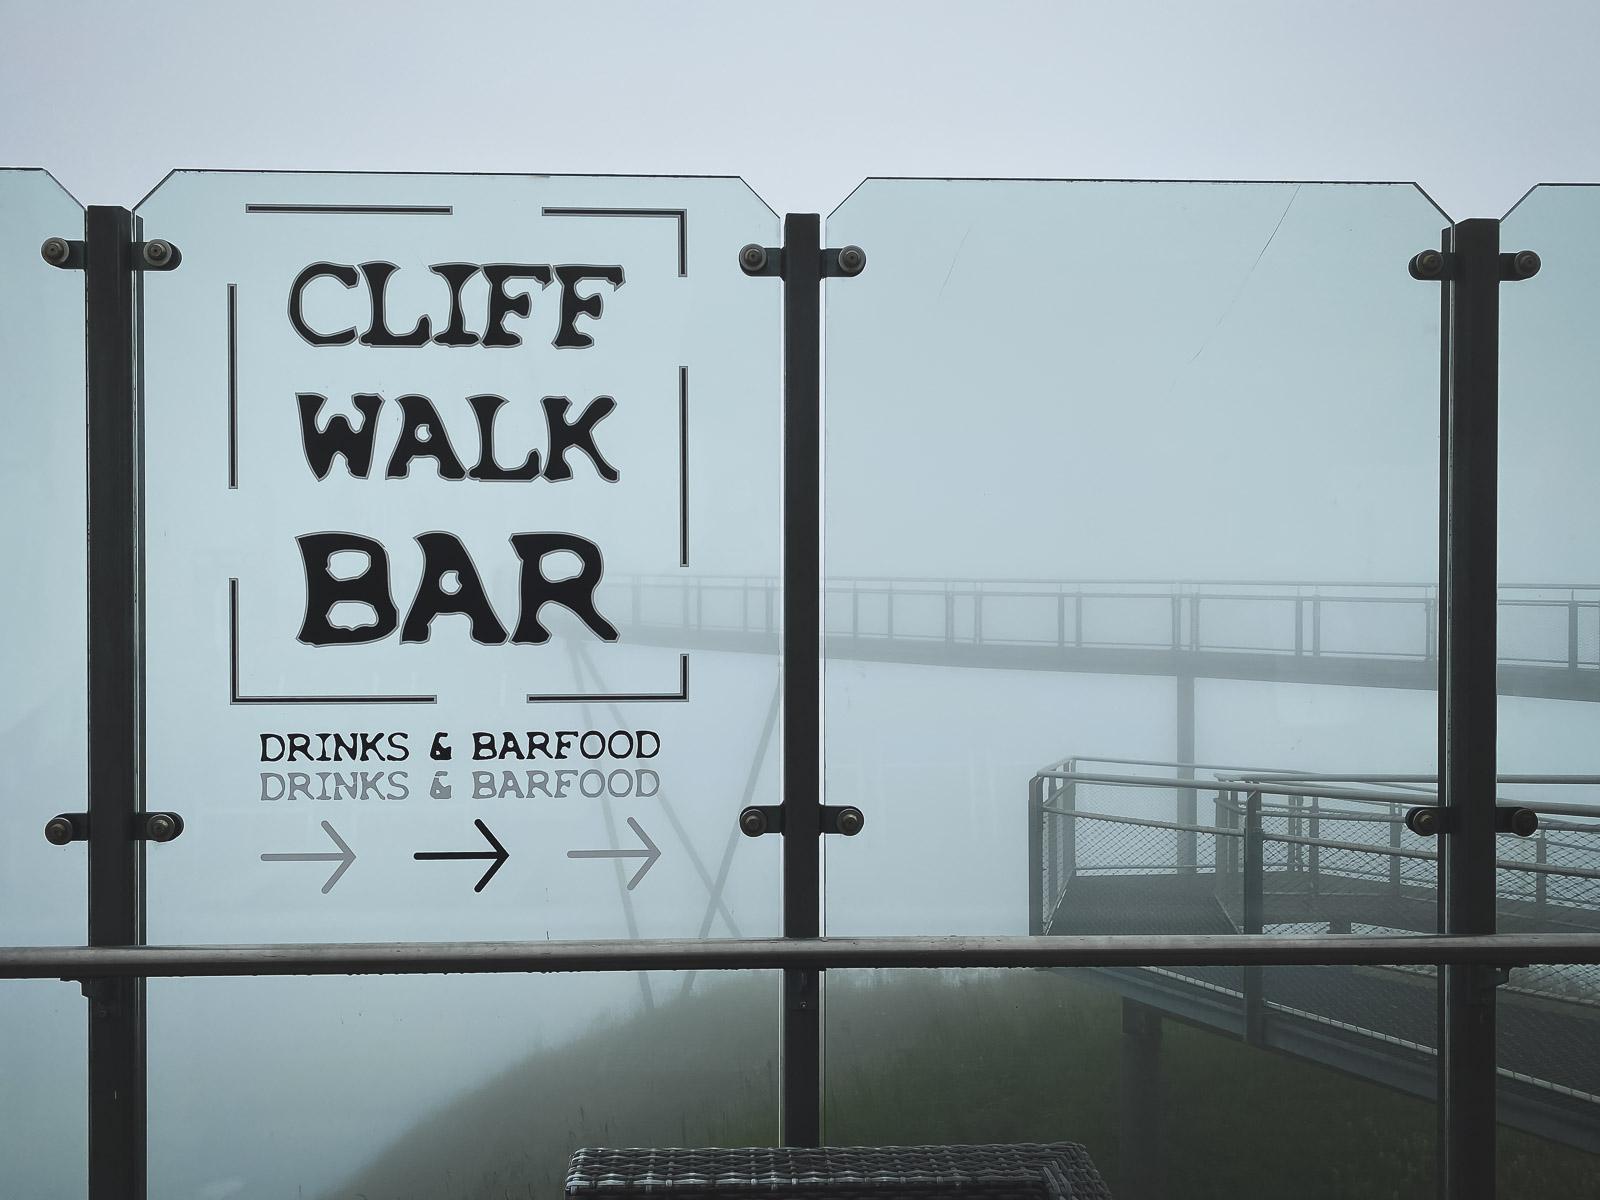 Relax at Cliff Walk Bar